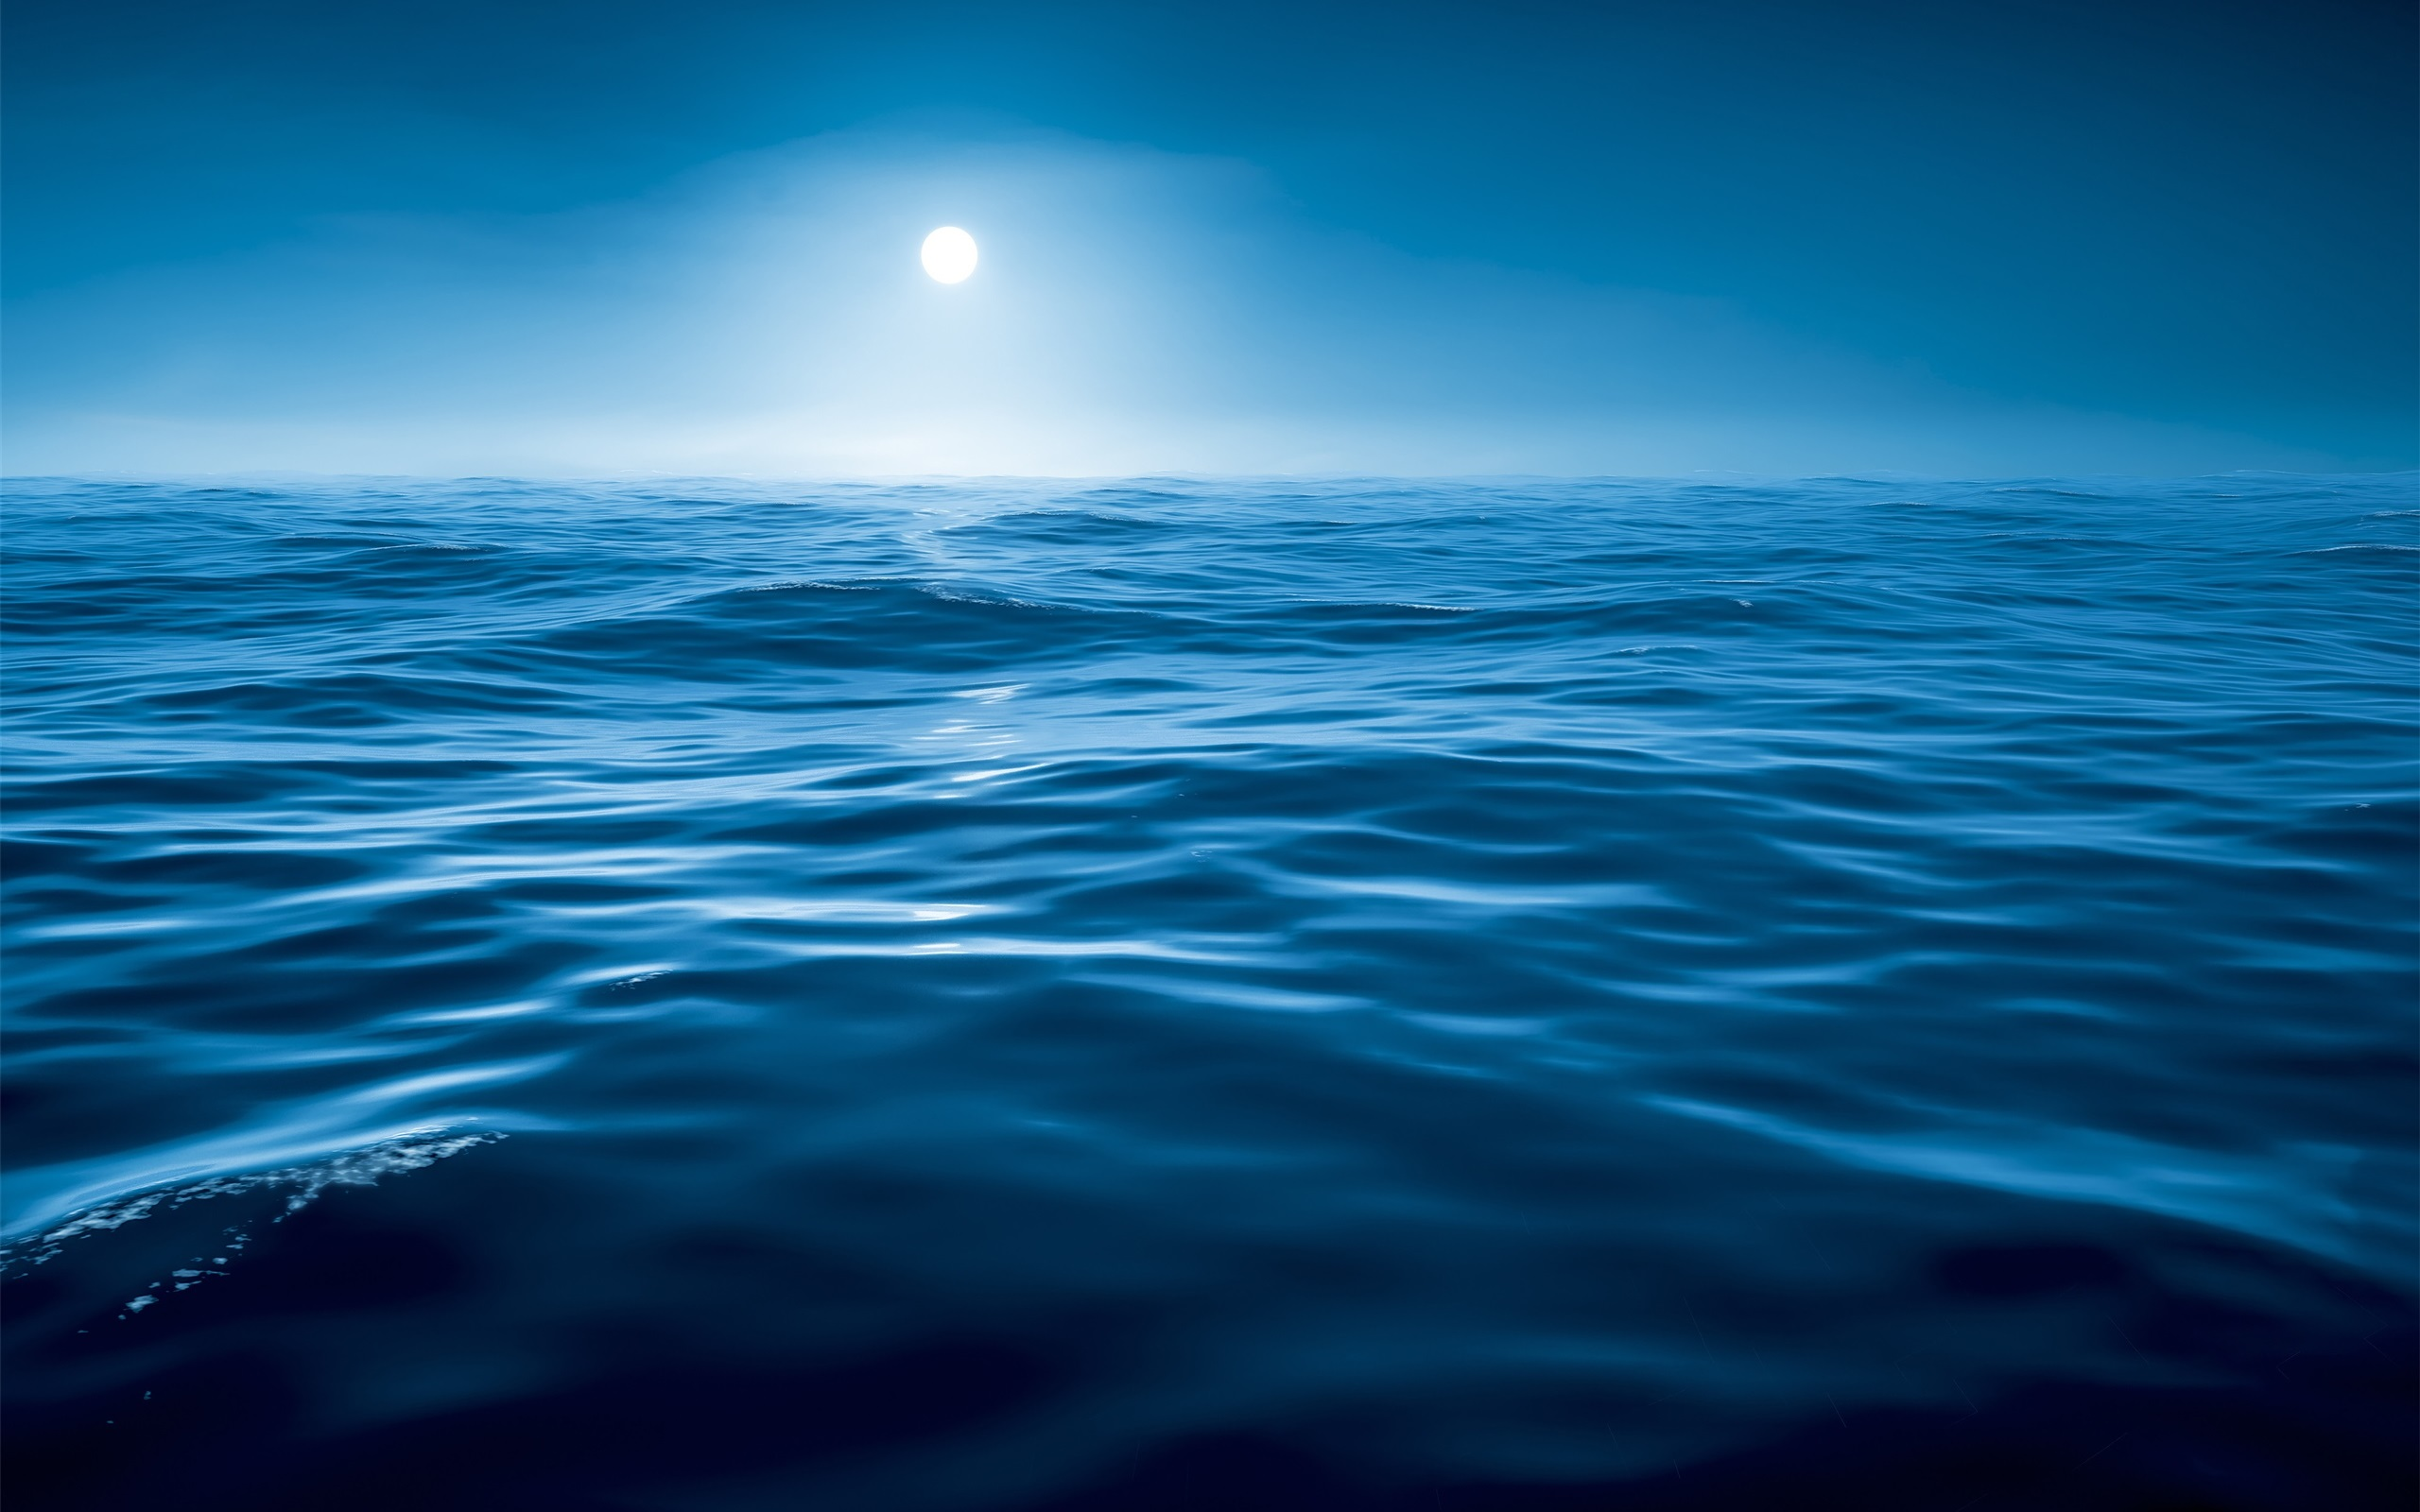 Sea water wallpaper